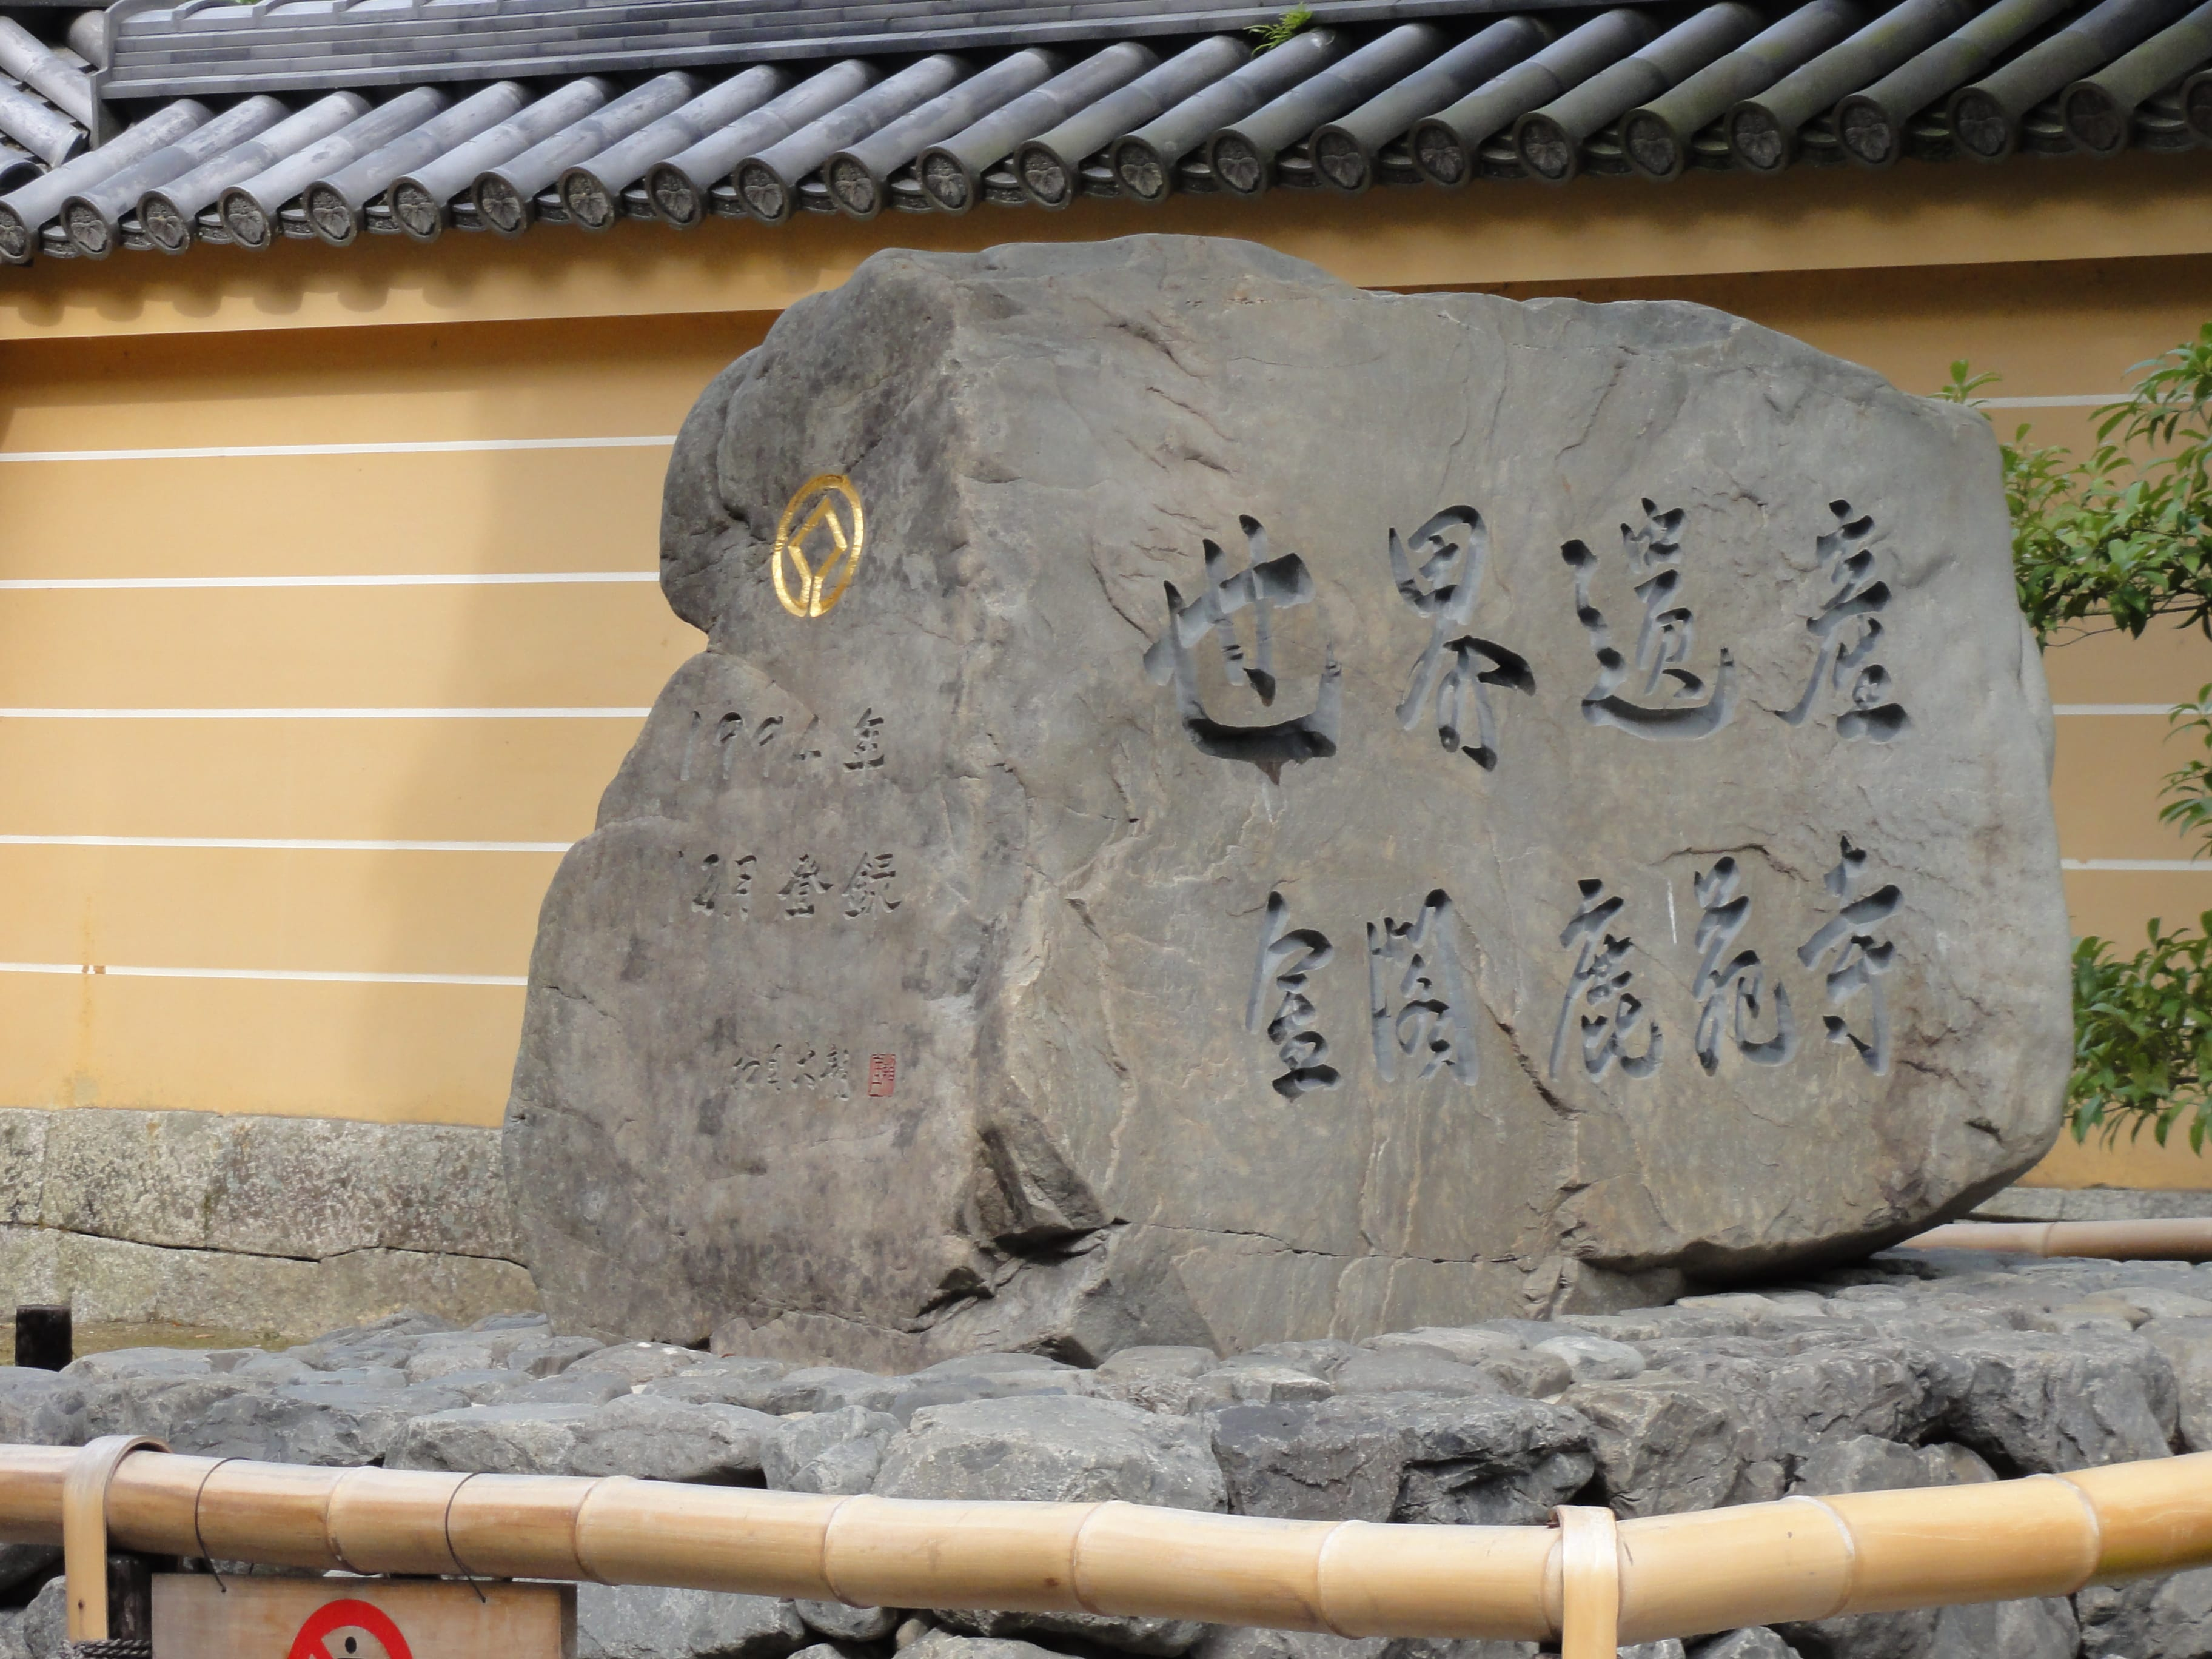 鹿苑寺入り口石碑